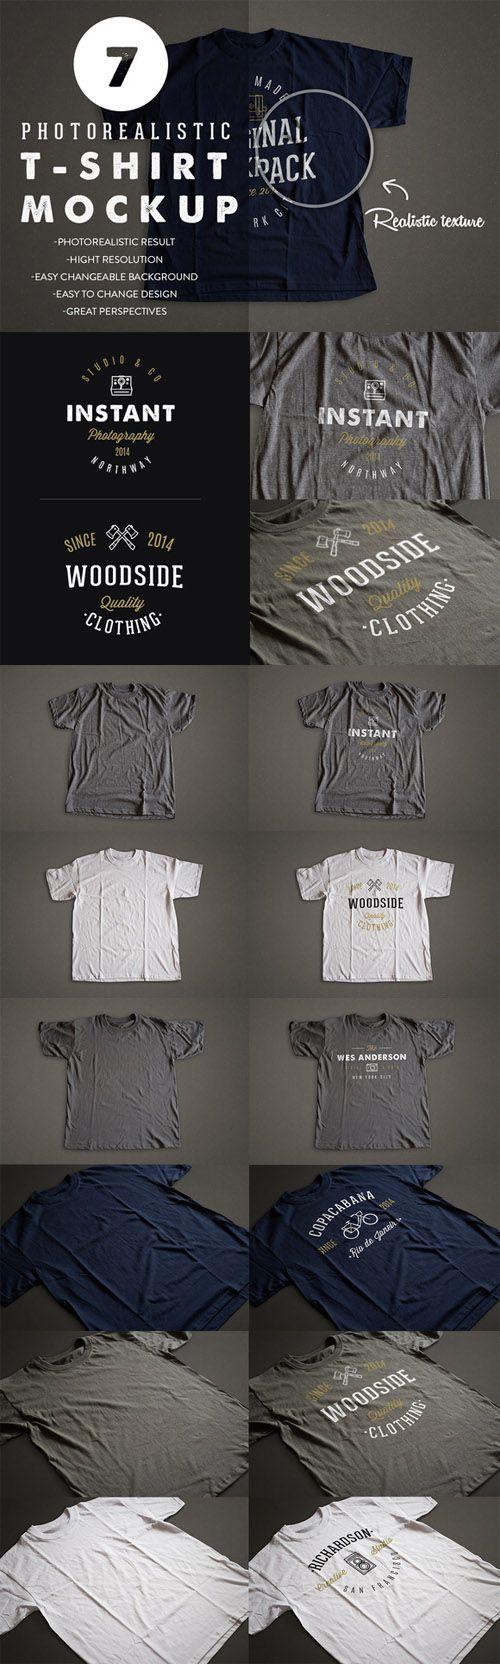 CreativeMarket – Photorealistic T-Shirt Mockup 2 68645 » NULLED PHP ...